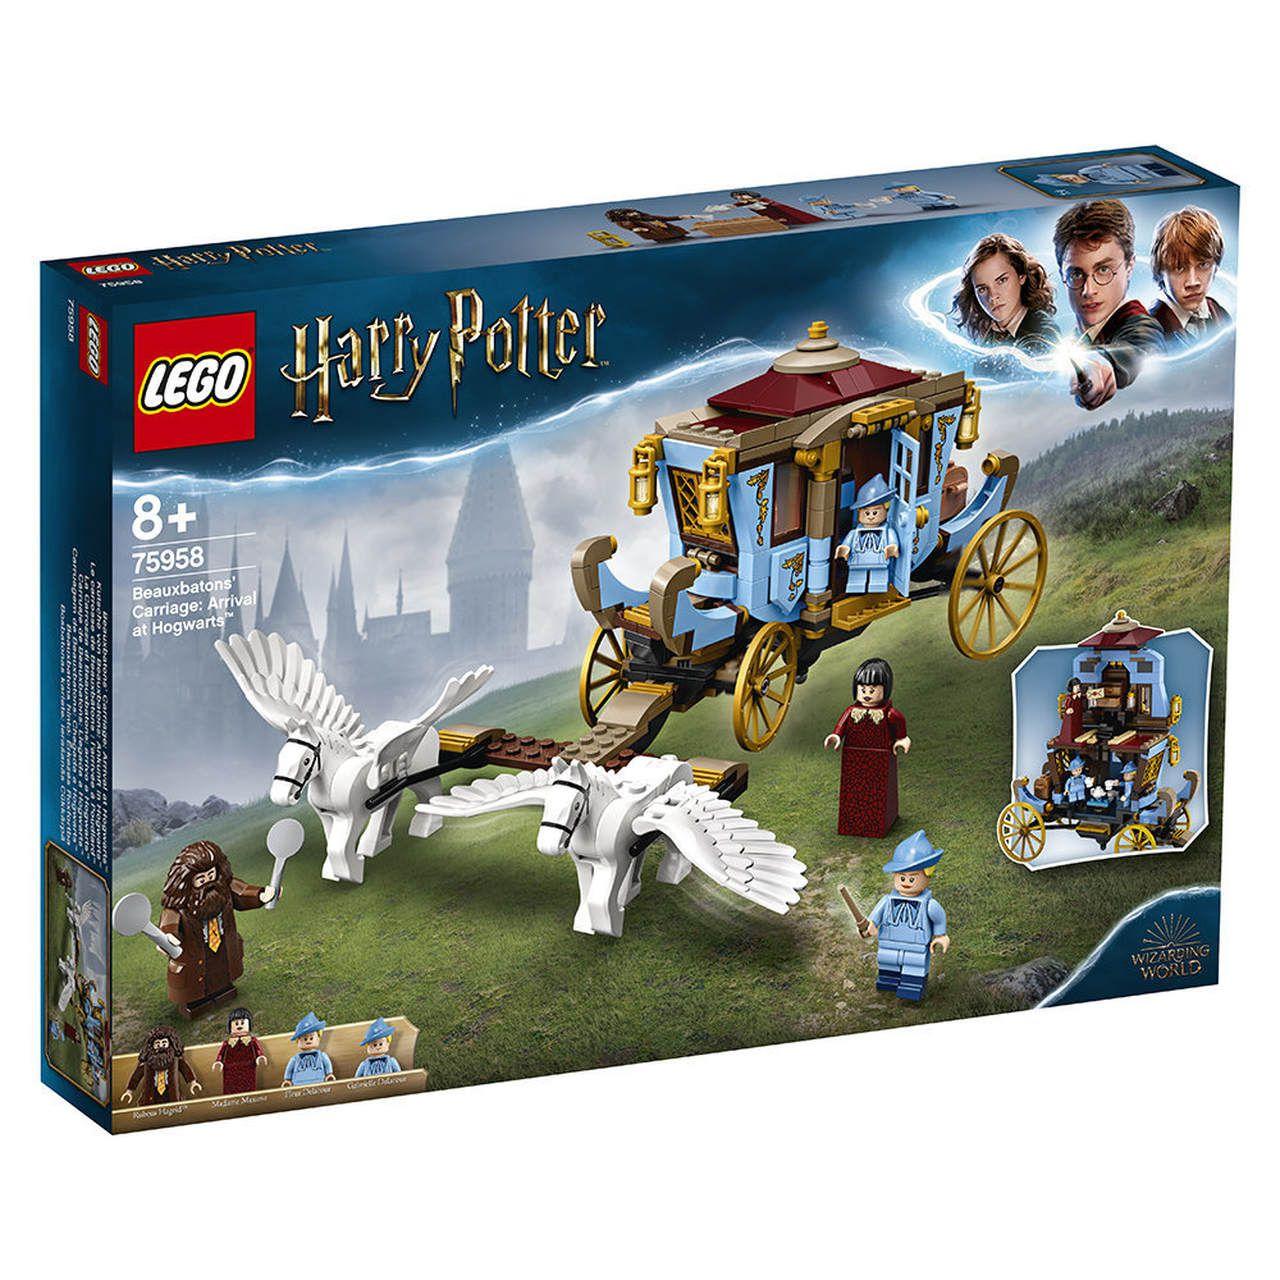 Lego Harry Potter Carruagem Beauxbatons: Chegada A Hogwarts